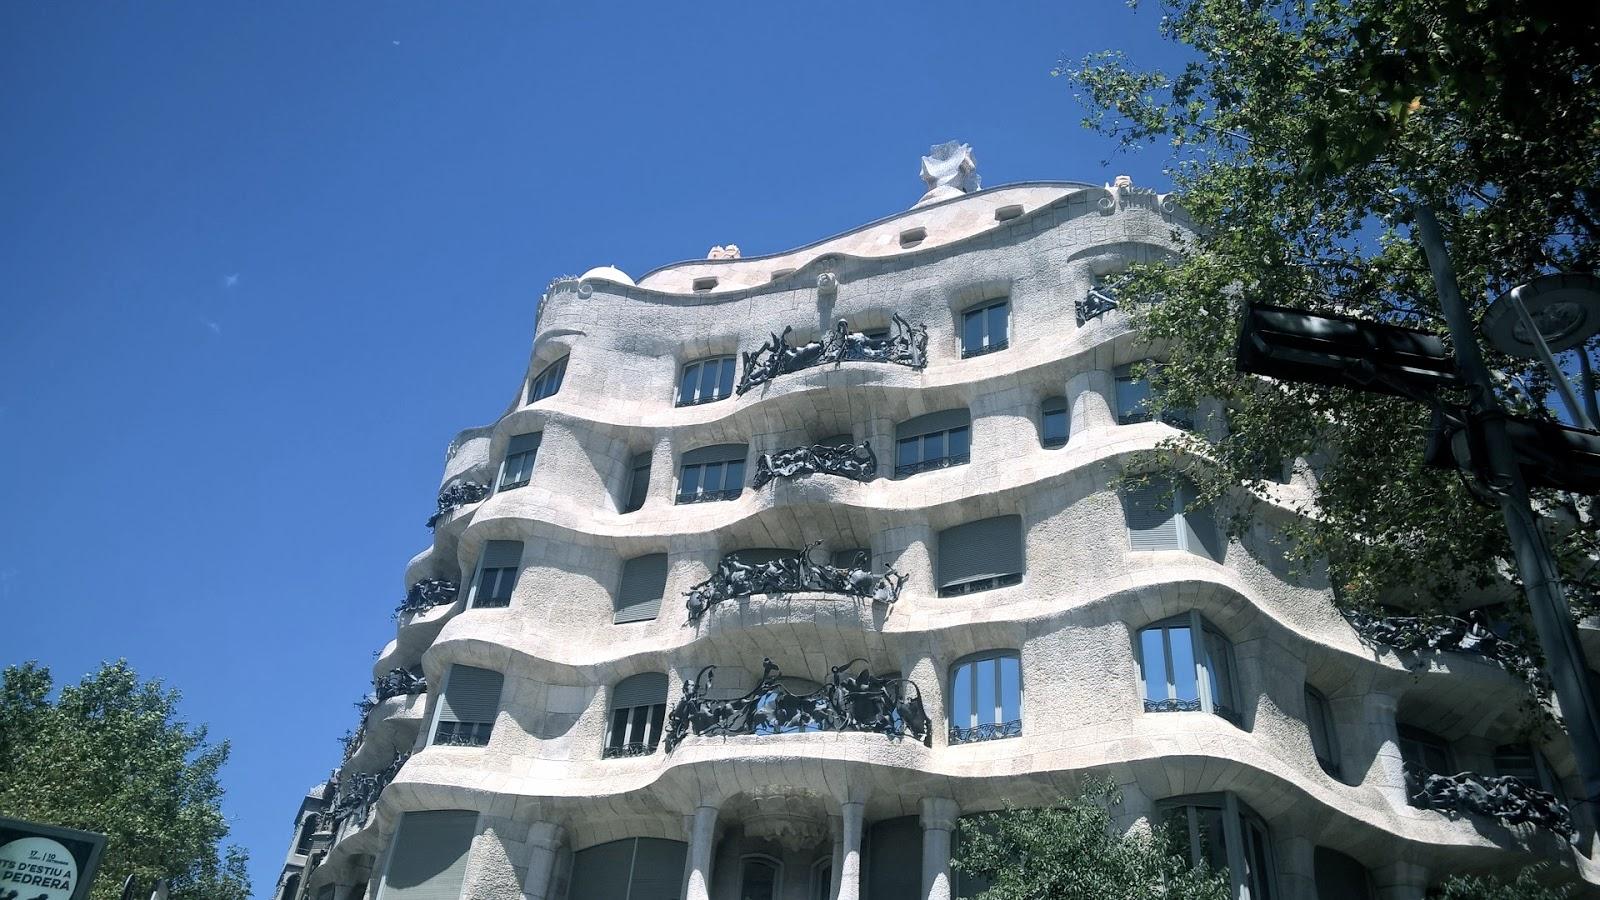 Casa Mila (aka La Pedrera) A building by Antoni Gaudi